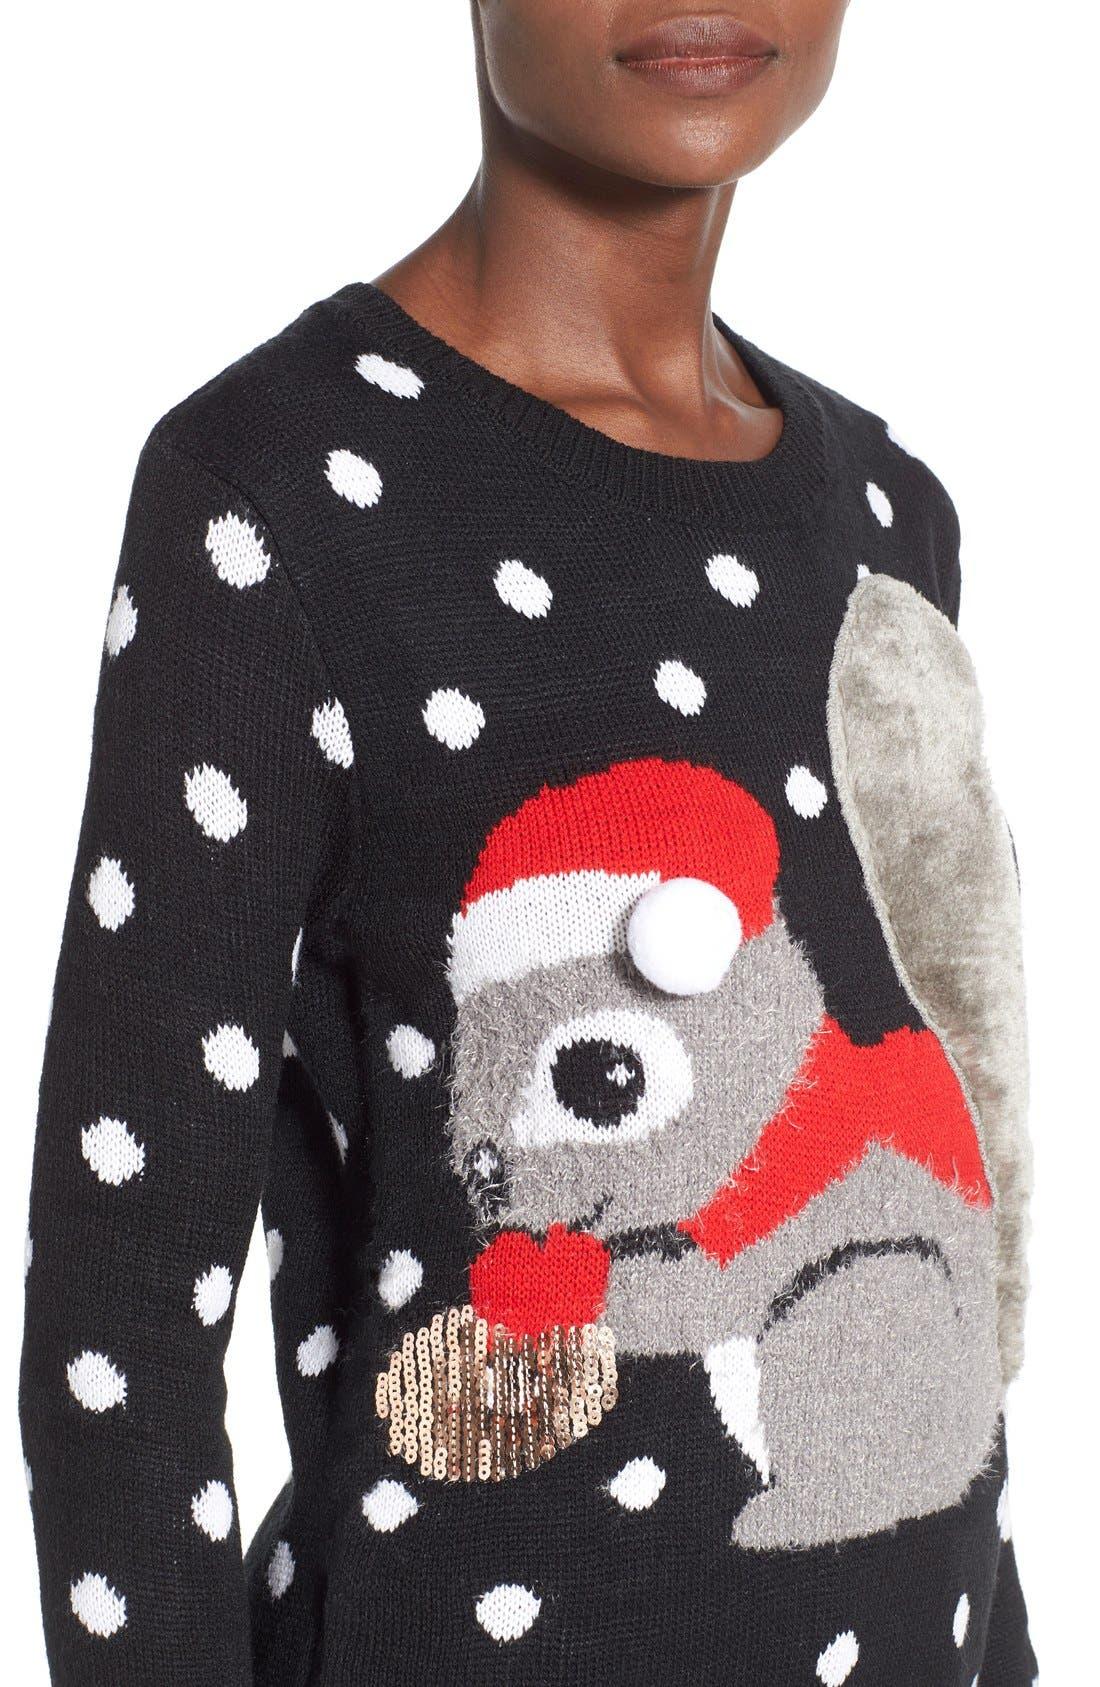 TEN SIXTY SHERMAN,                             Squirrel Christmas Sweater,                             Alternate thumbnail 5, color,                             001